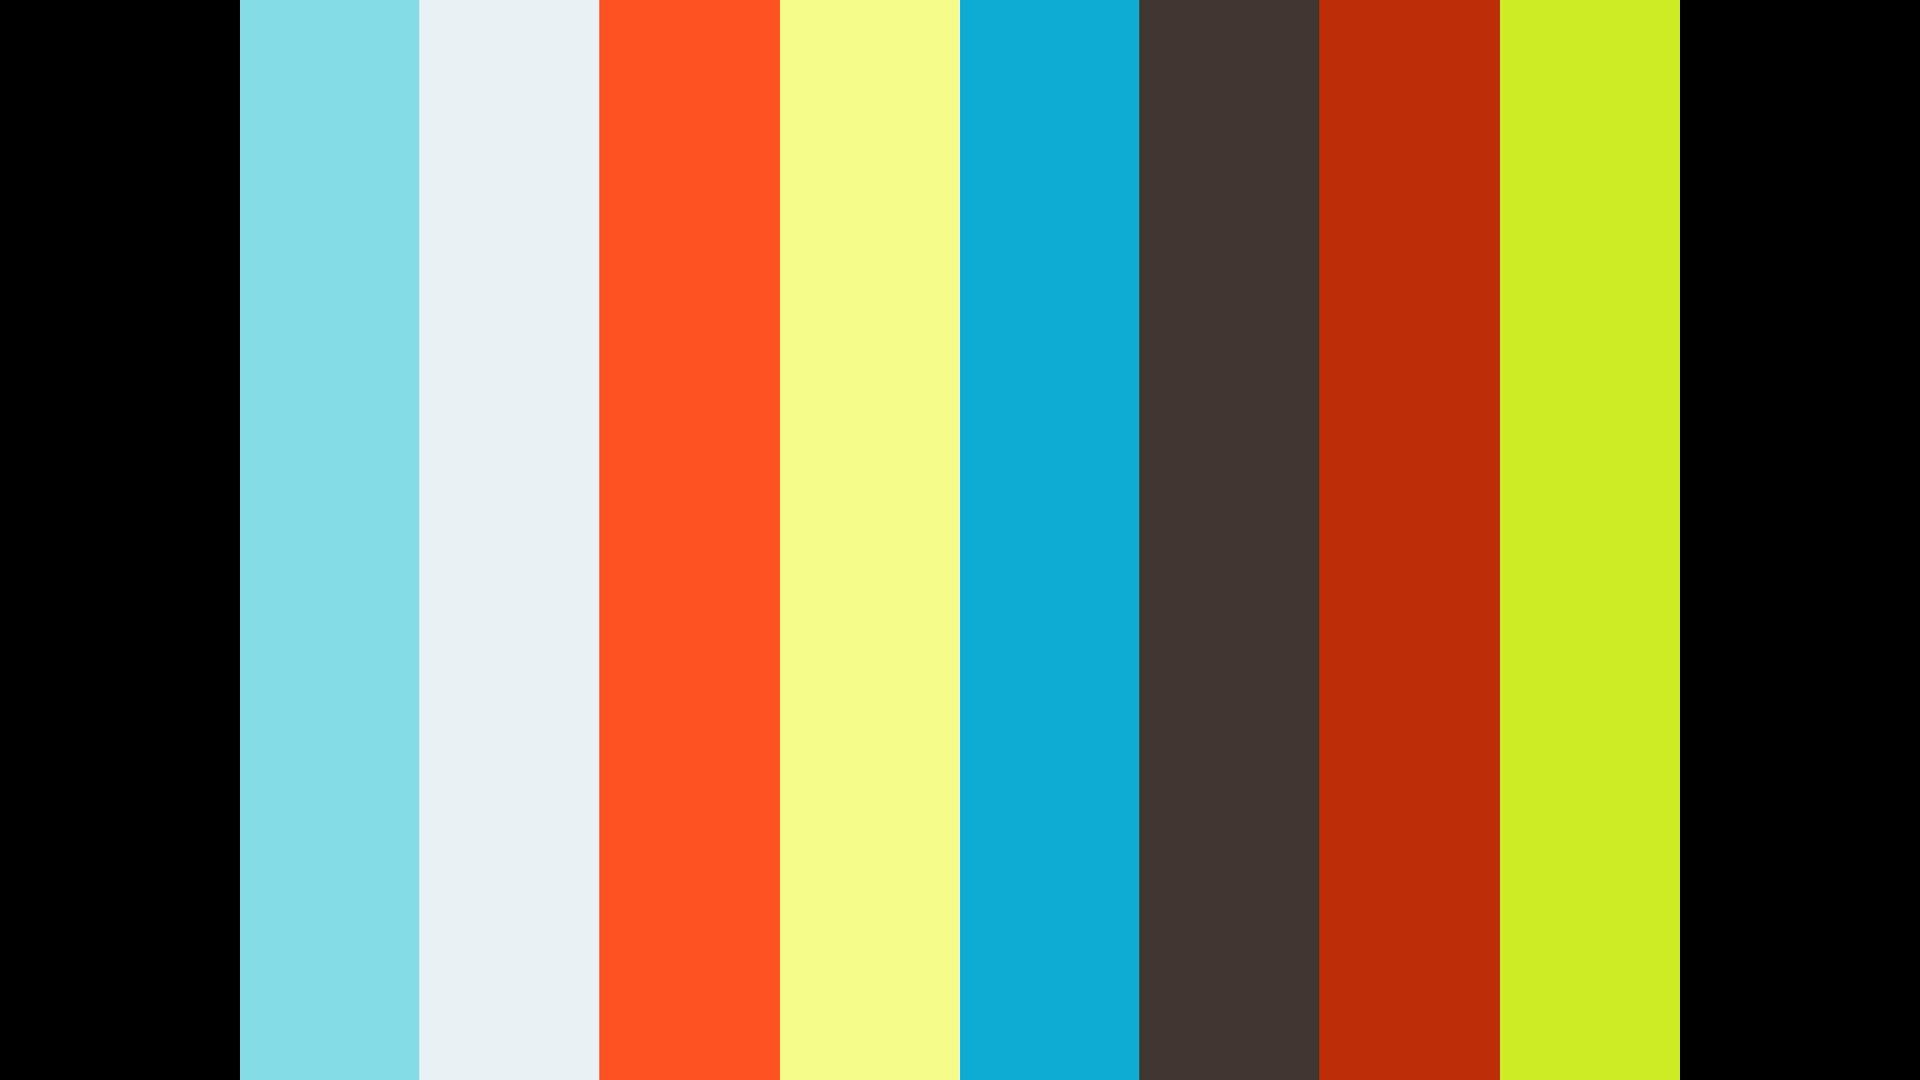 2020-02-16 ILOT TENIA - SKYVIEW-2